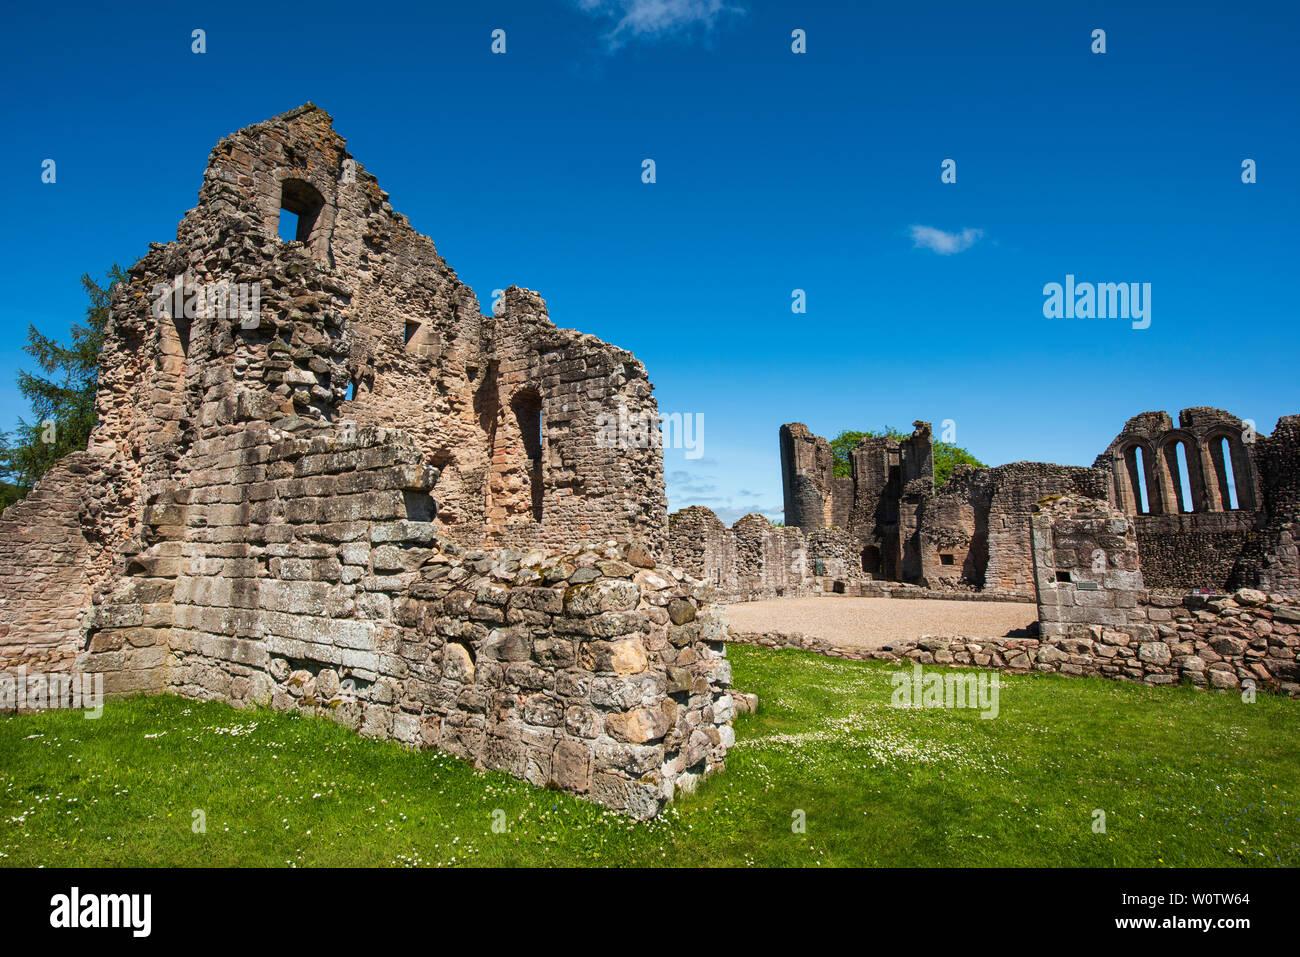 Kildrummy Castle, Aberdeenshire, Scotland. - Stock Image